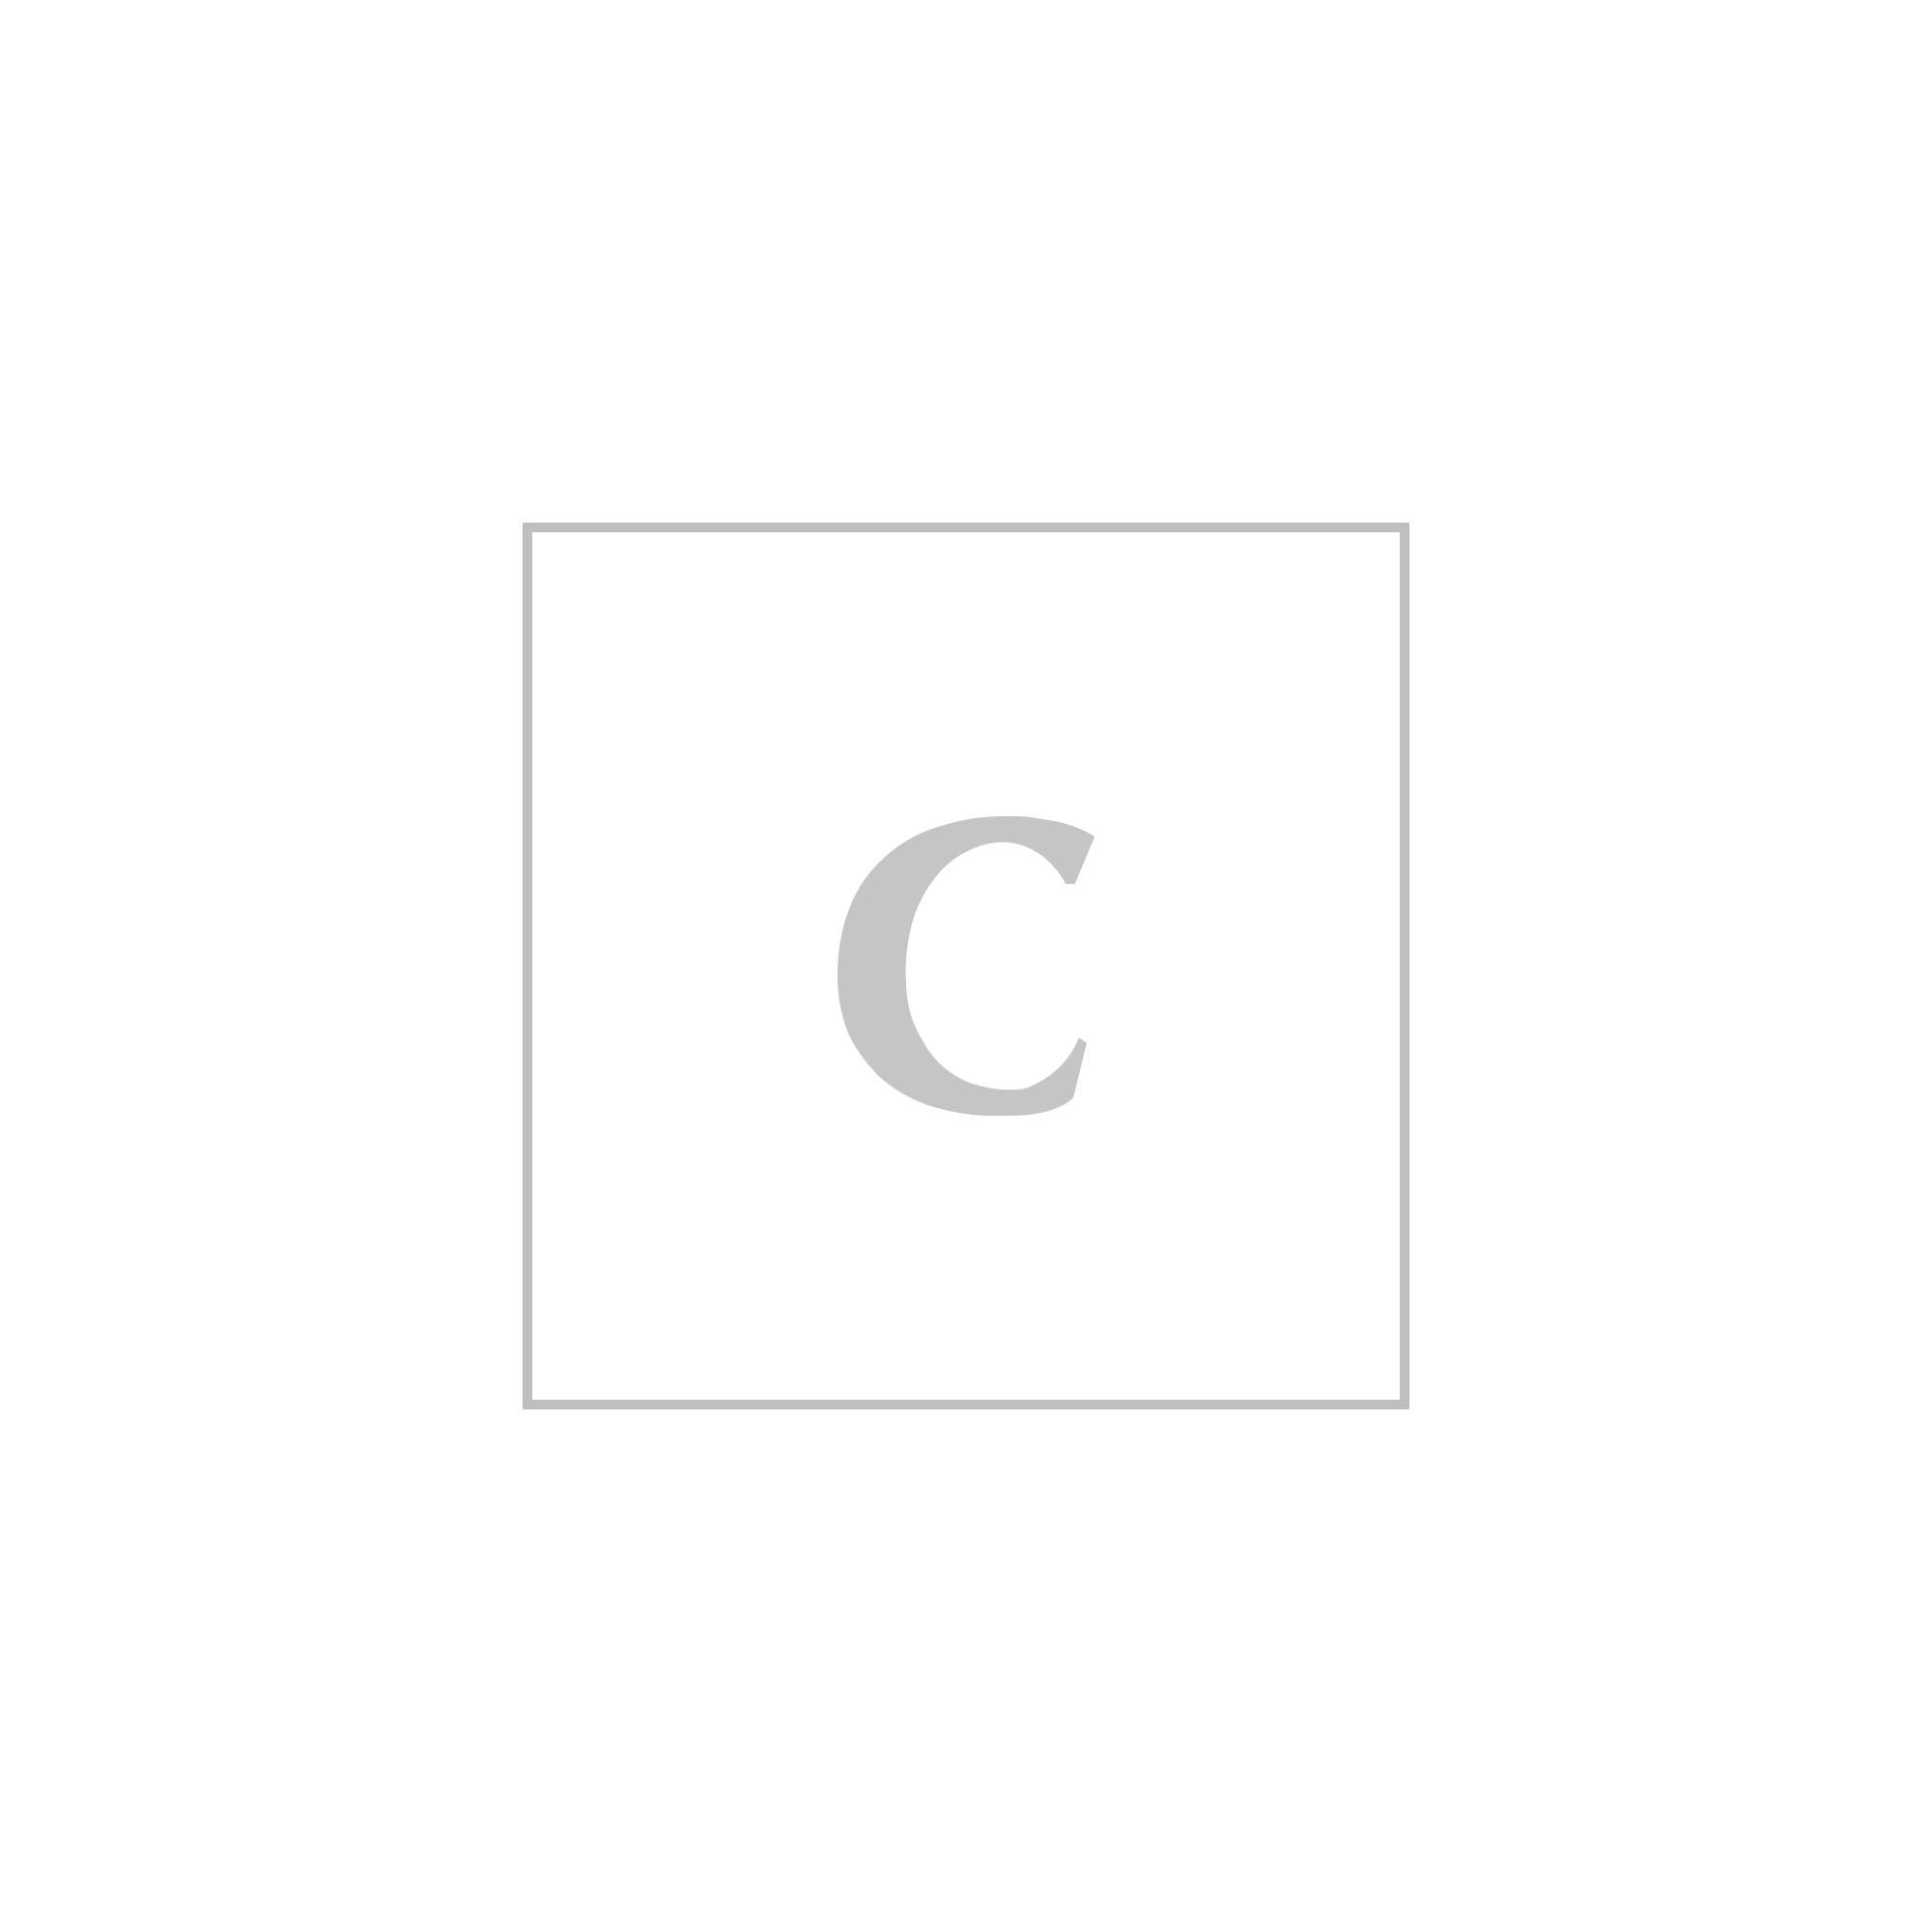 Moncler piumino akylina